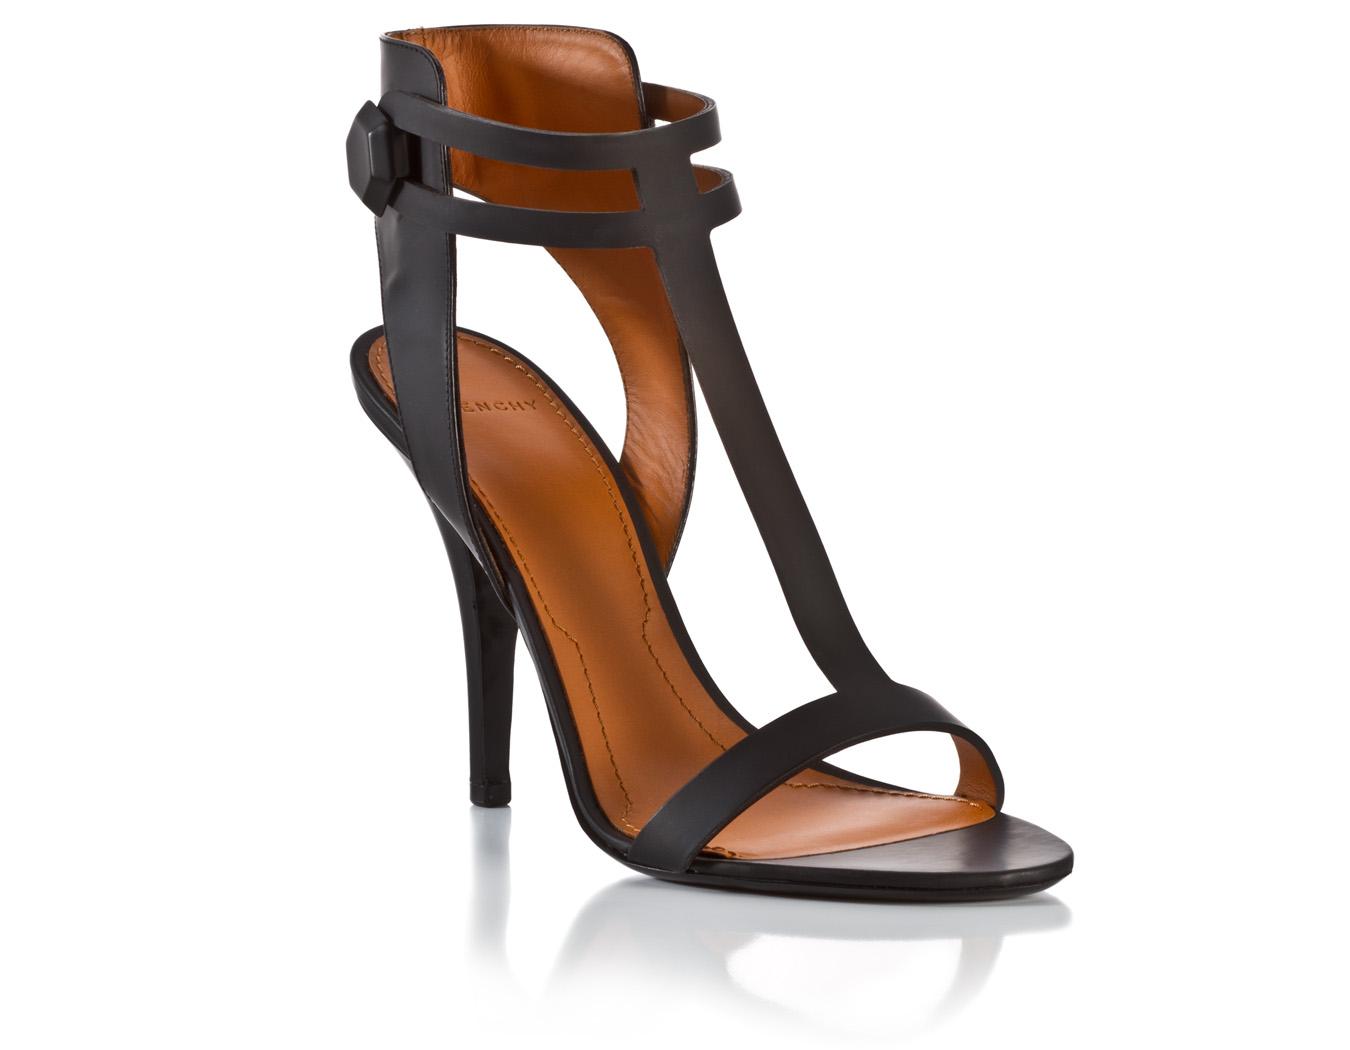 Givenchy shoe product photo